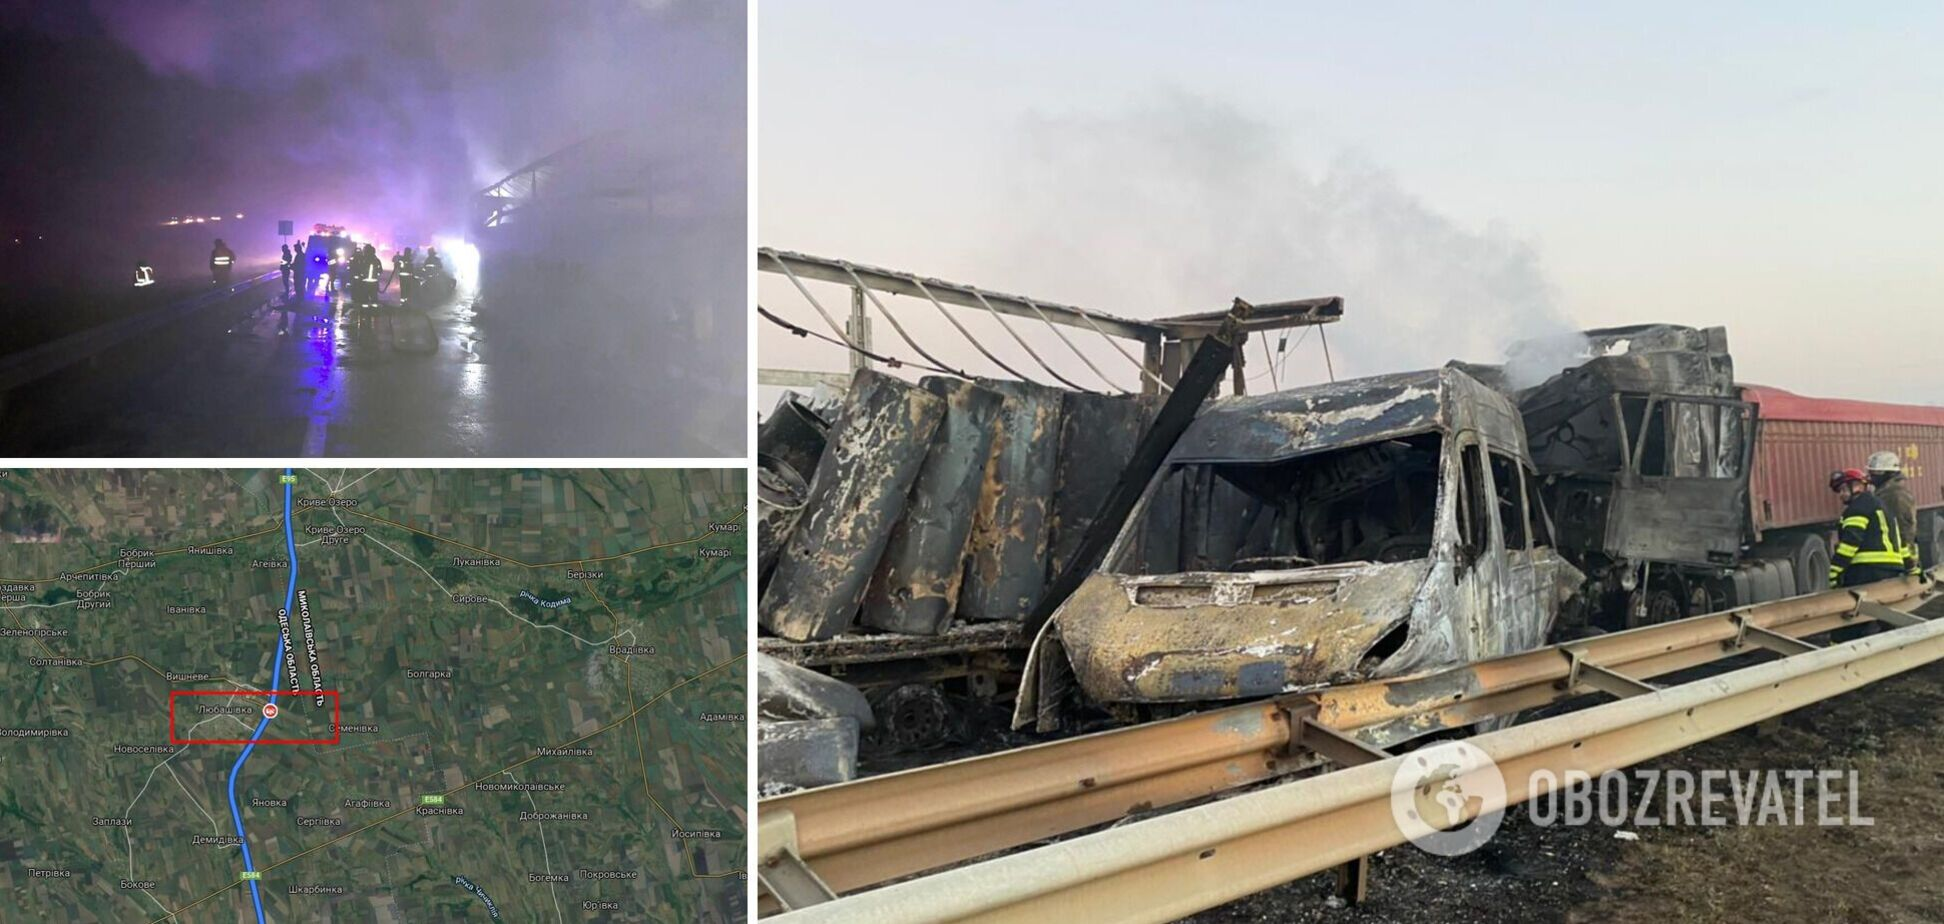 На трассе Киев – Одесса произошло масштабное ДТП, погибли три человека. Фото и видео